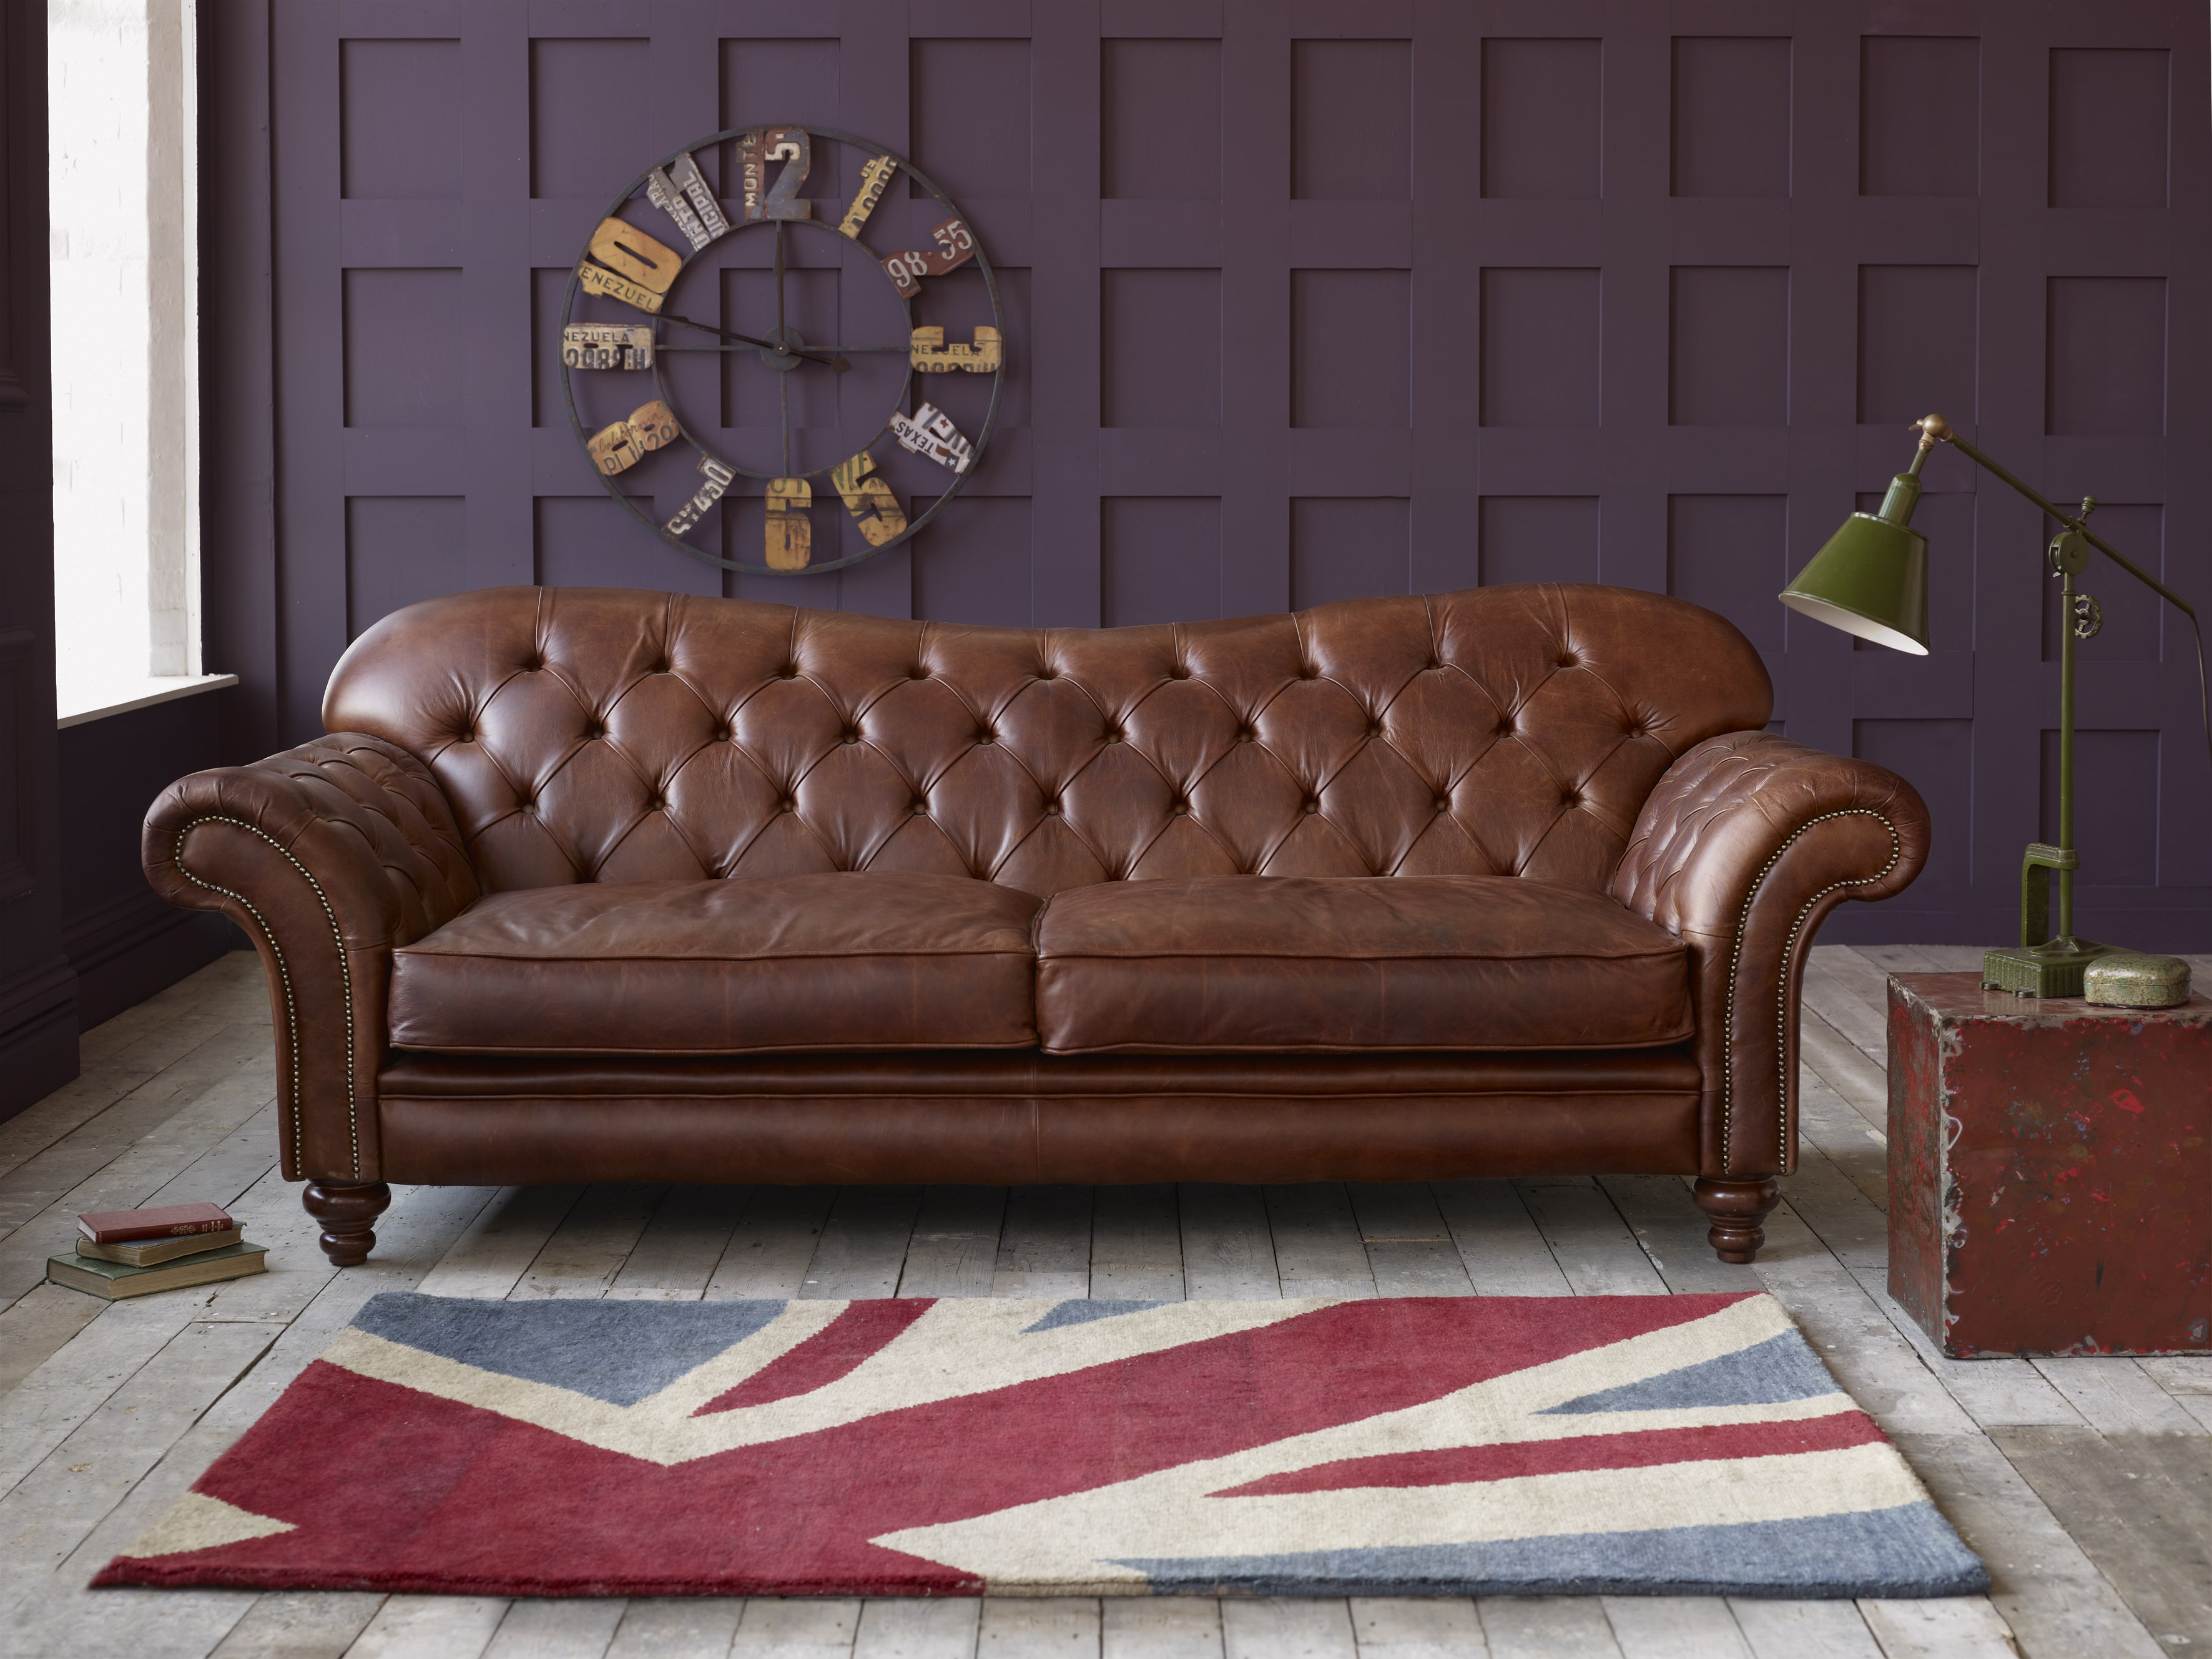 Arundel Chesterfield Sofa